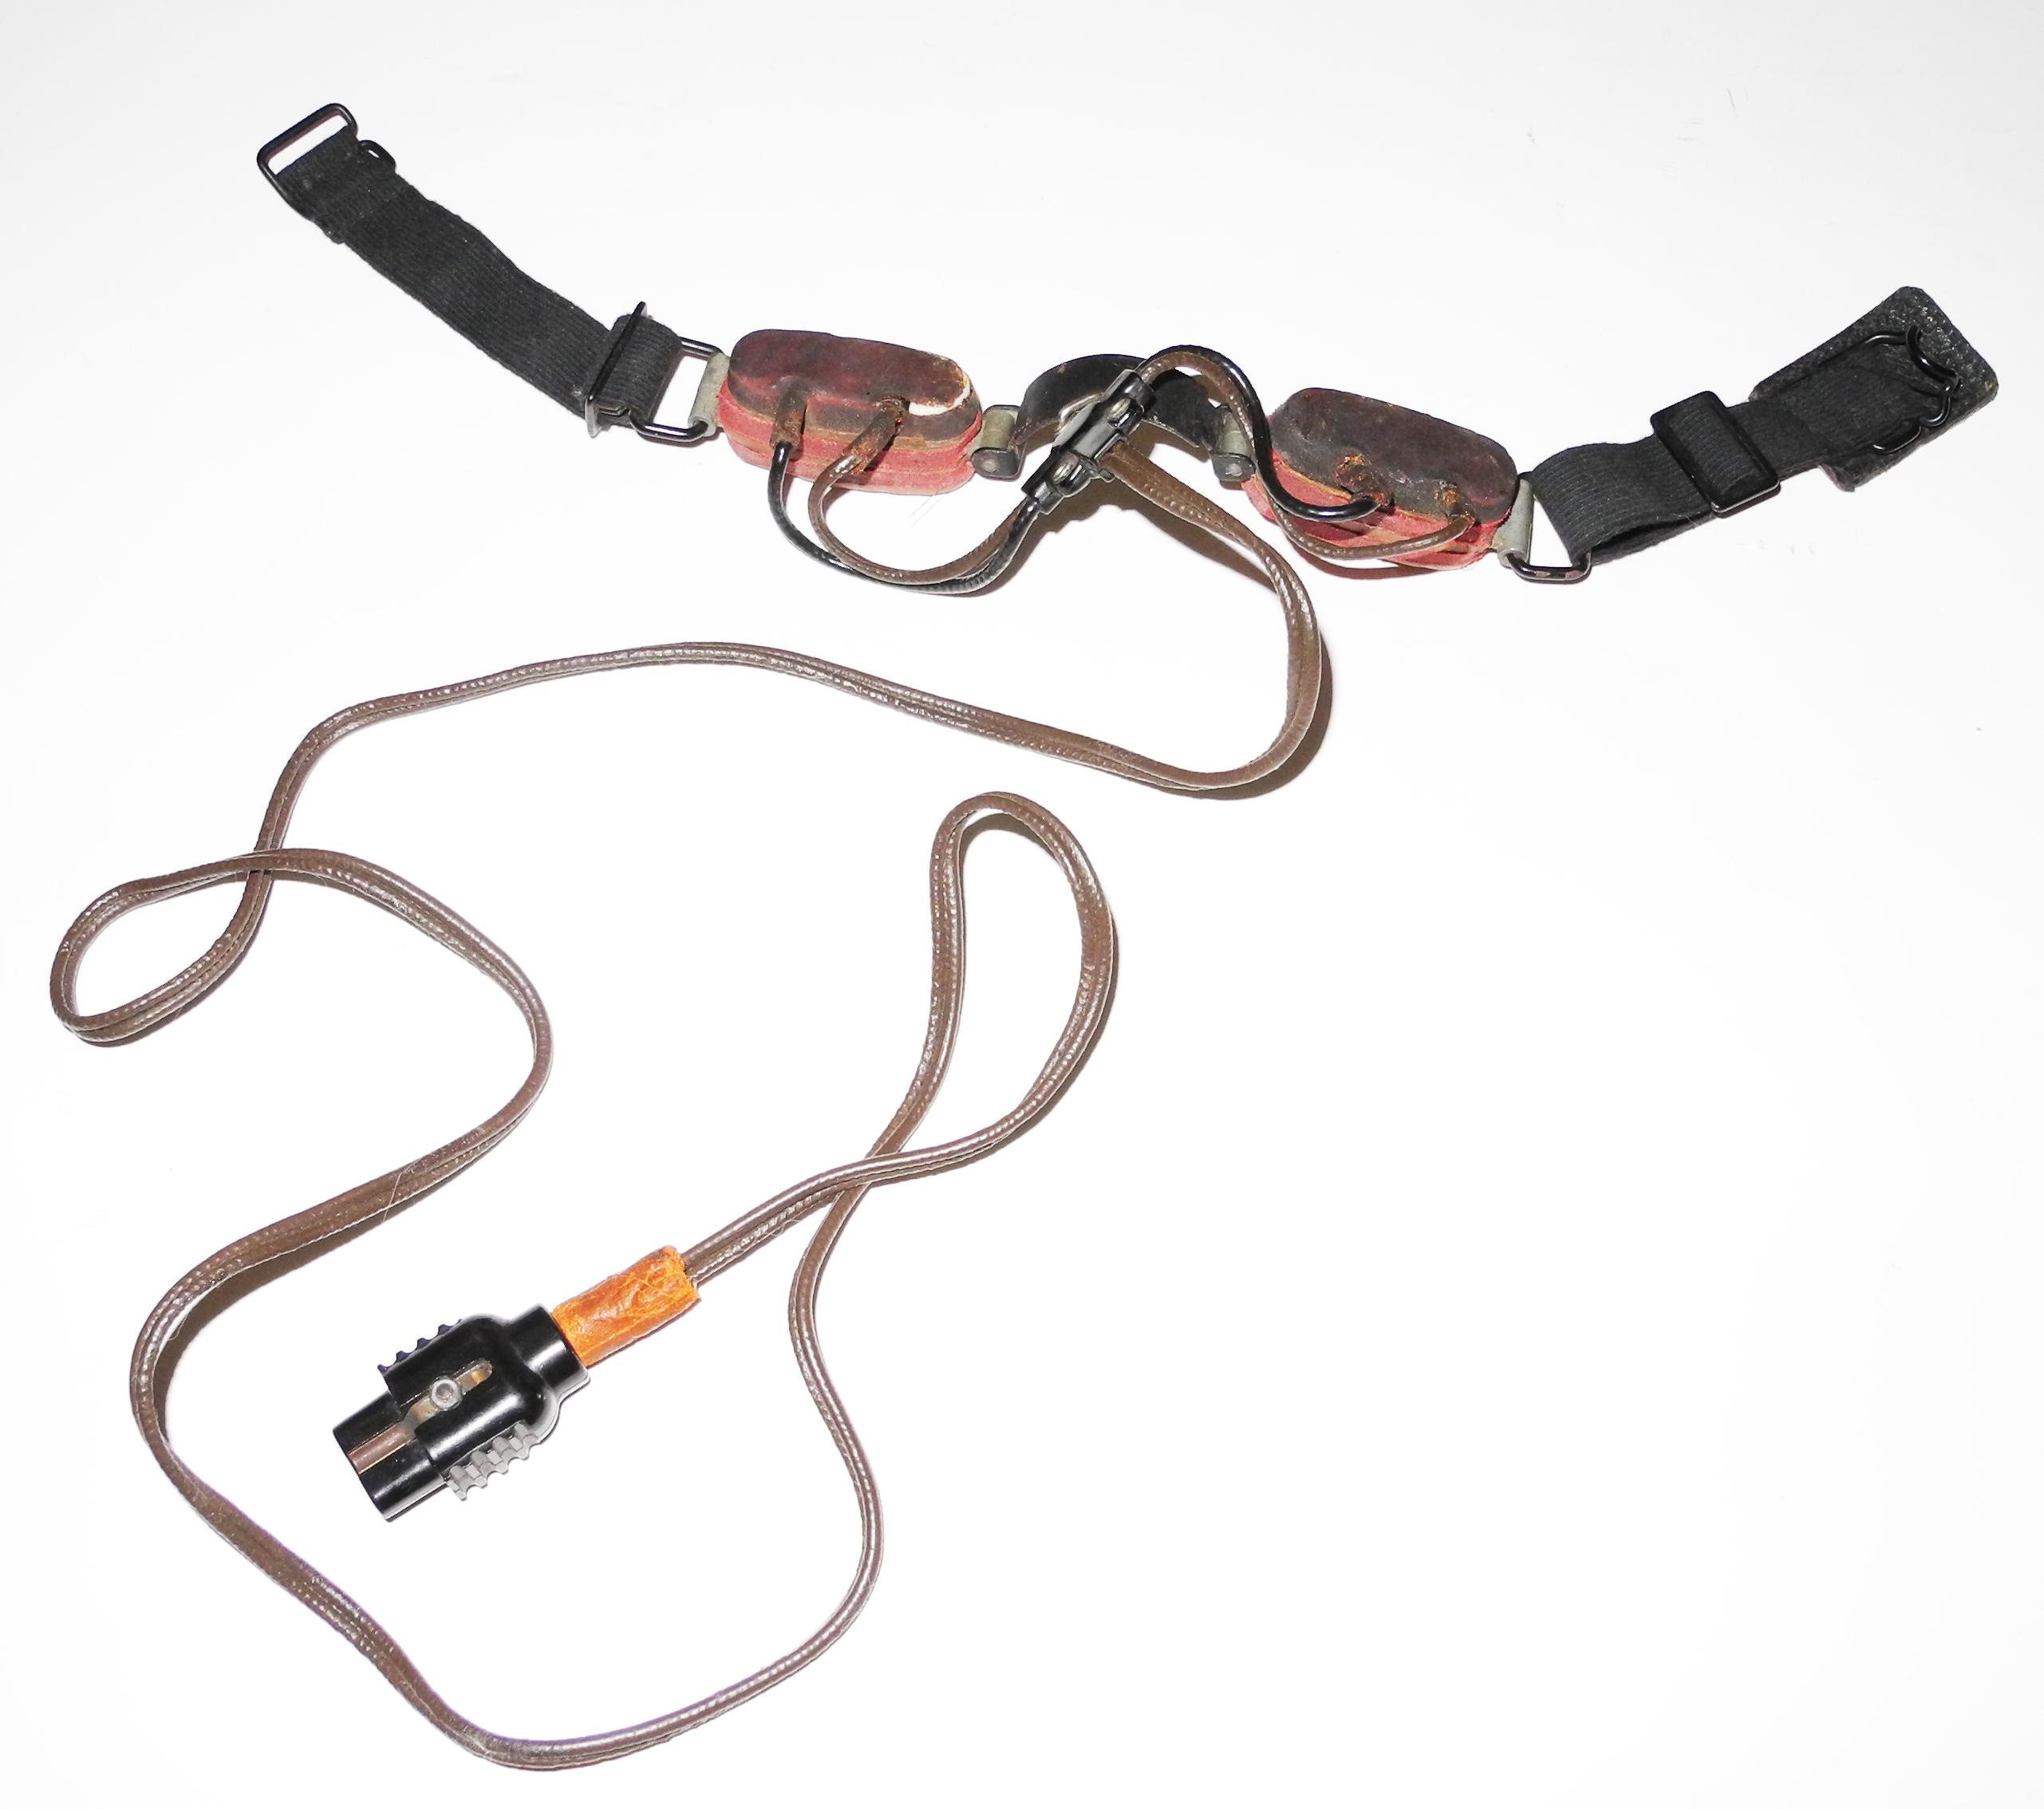 FAA throat microphone $175